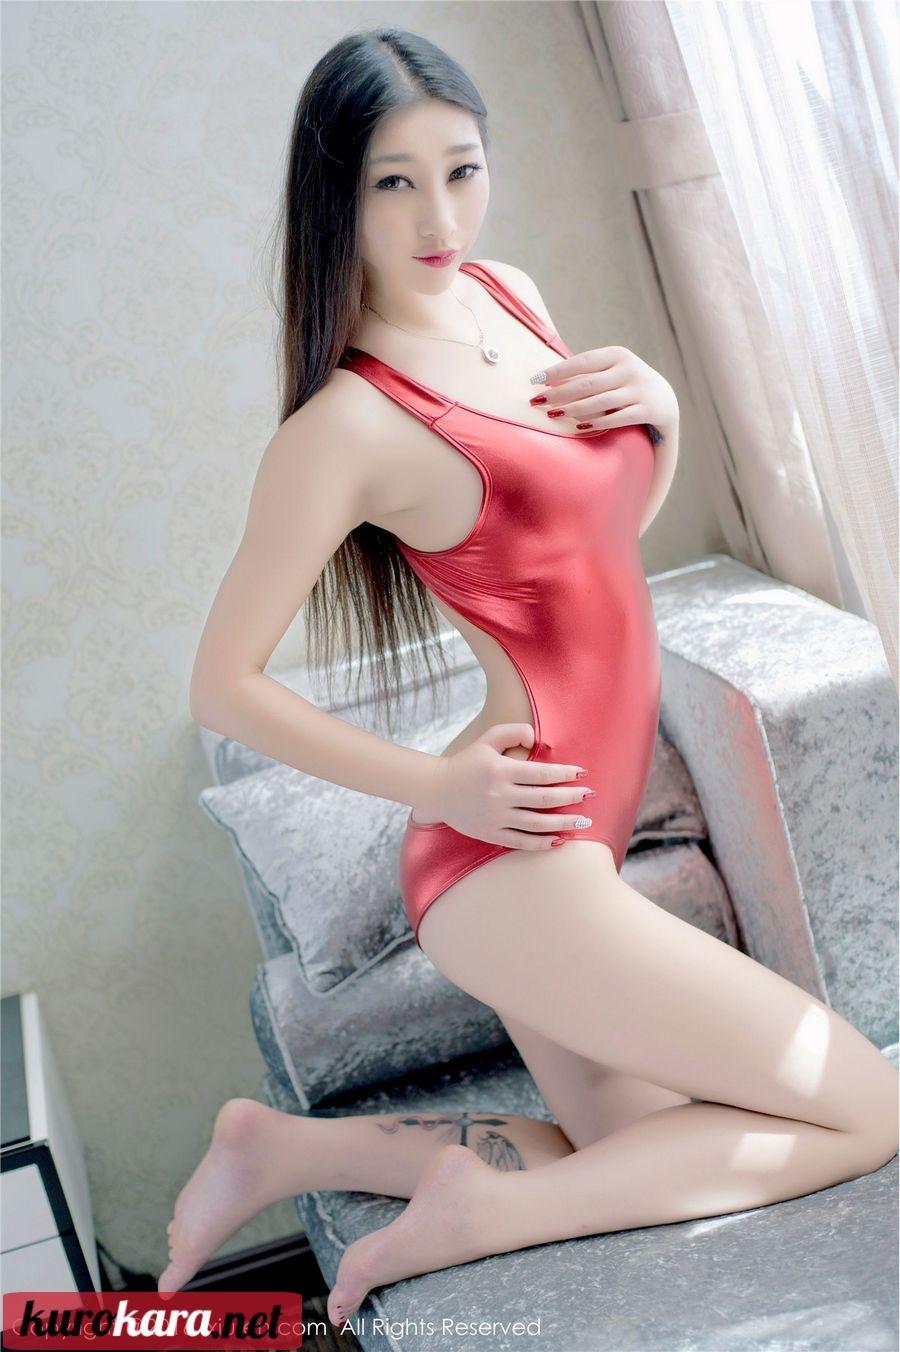 f4a7f2ef8da2d2c55a282e1e997b1a09 - Xiuren Hot Gallery Pic